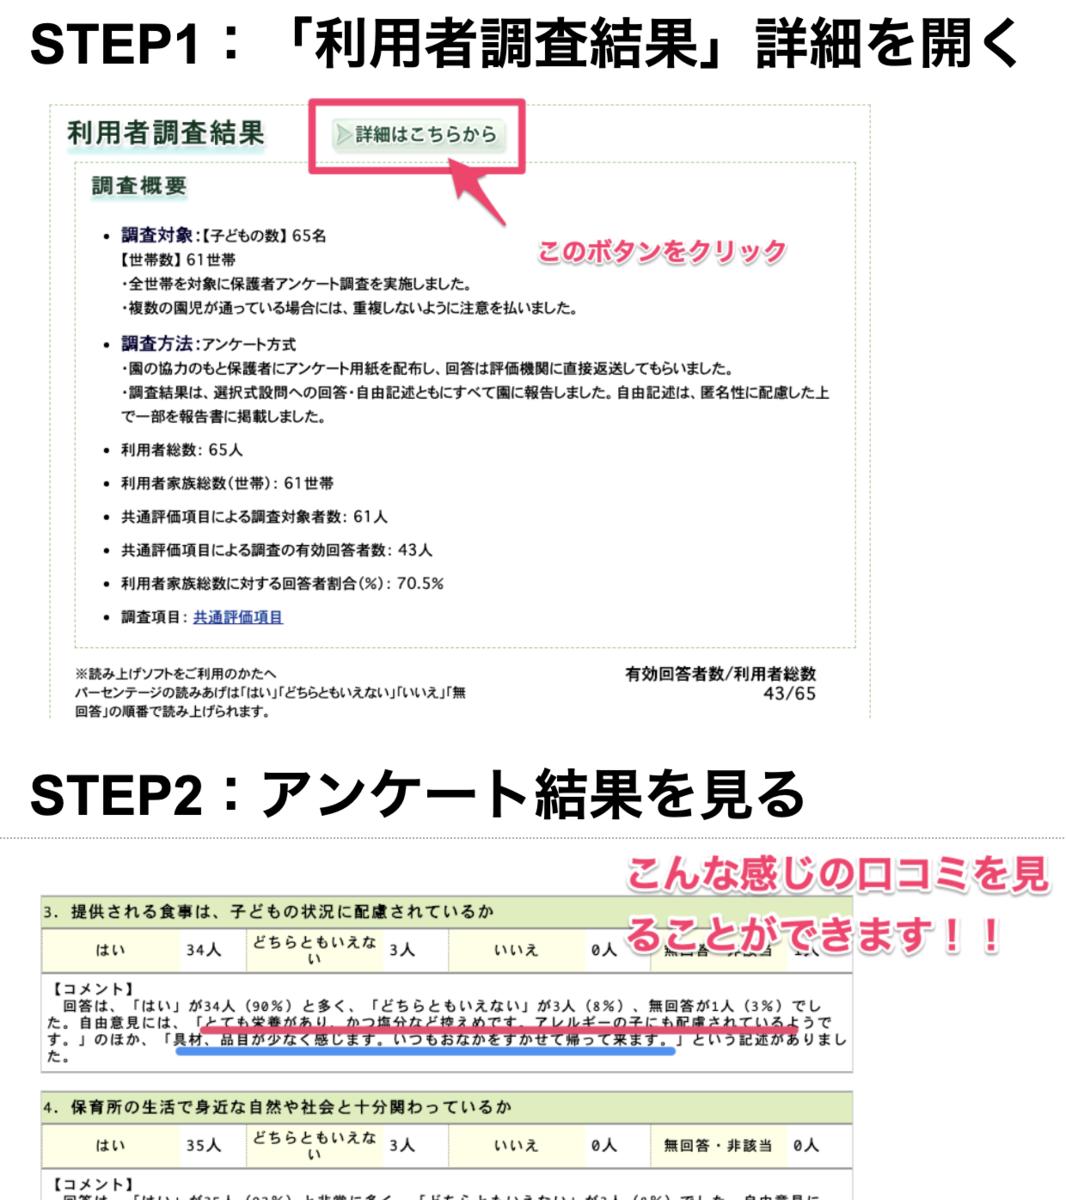 f:id:ninofku:20201119232713p:plain